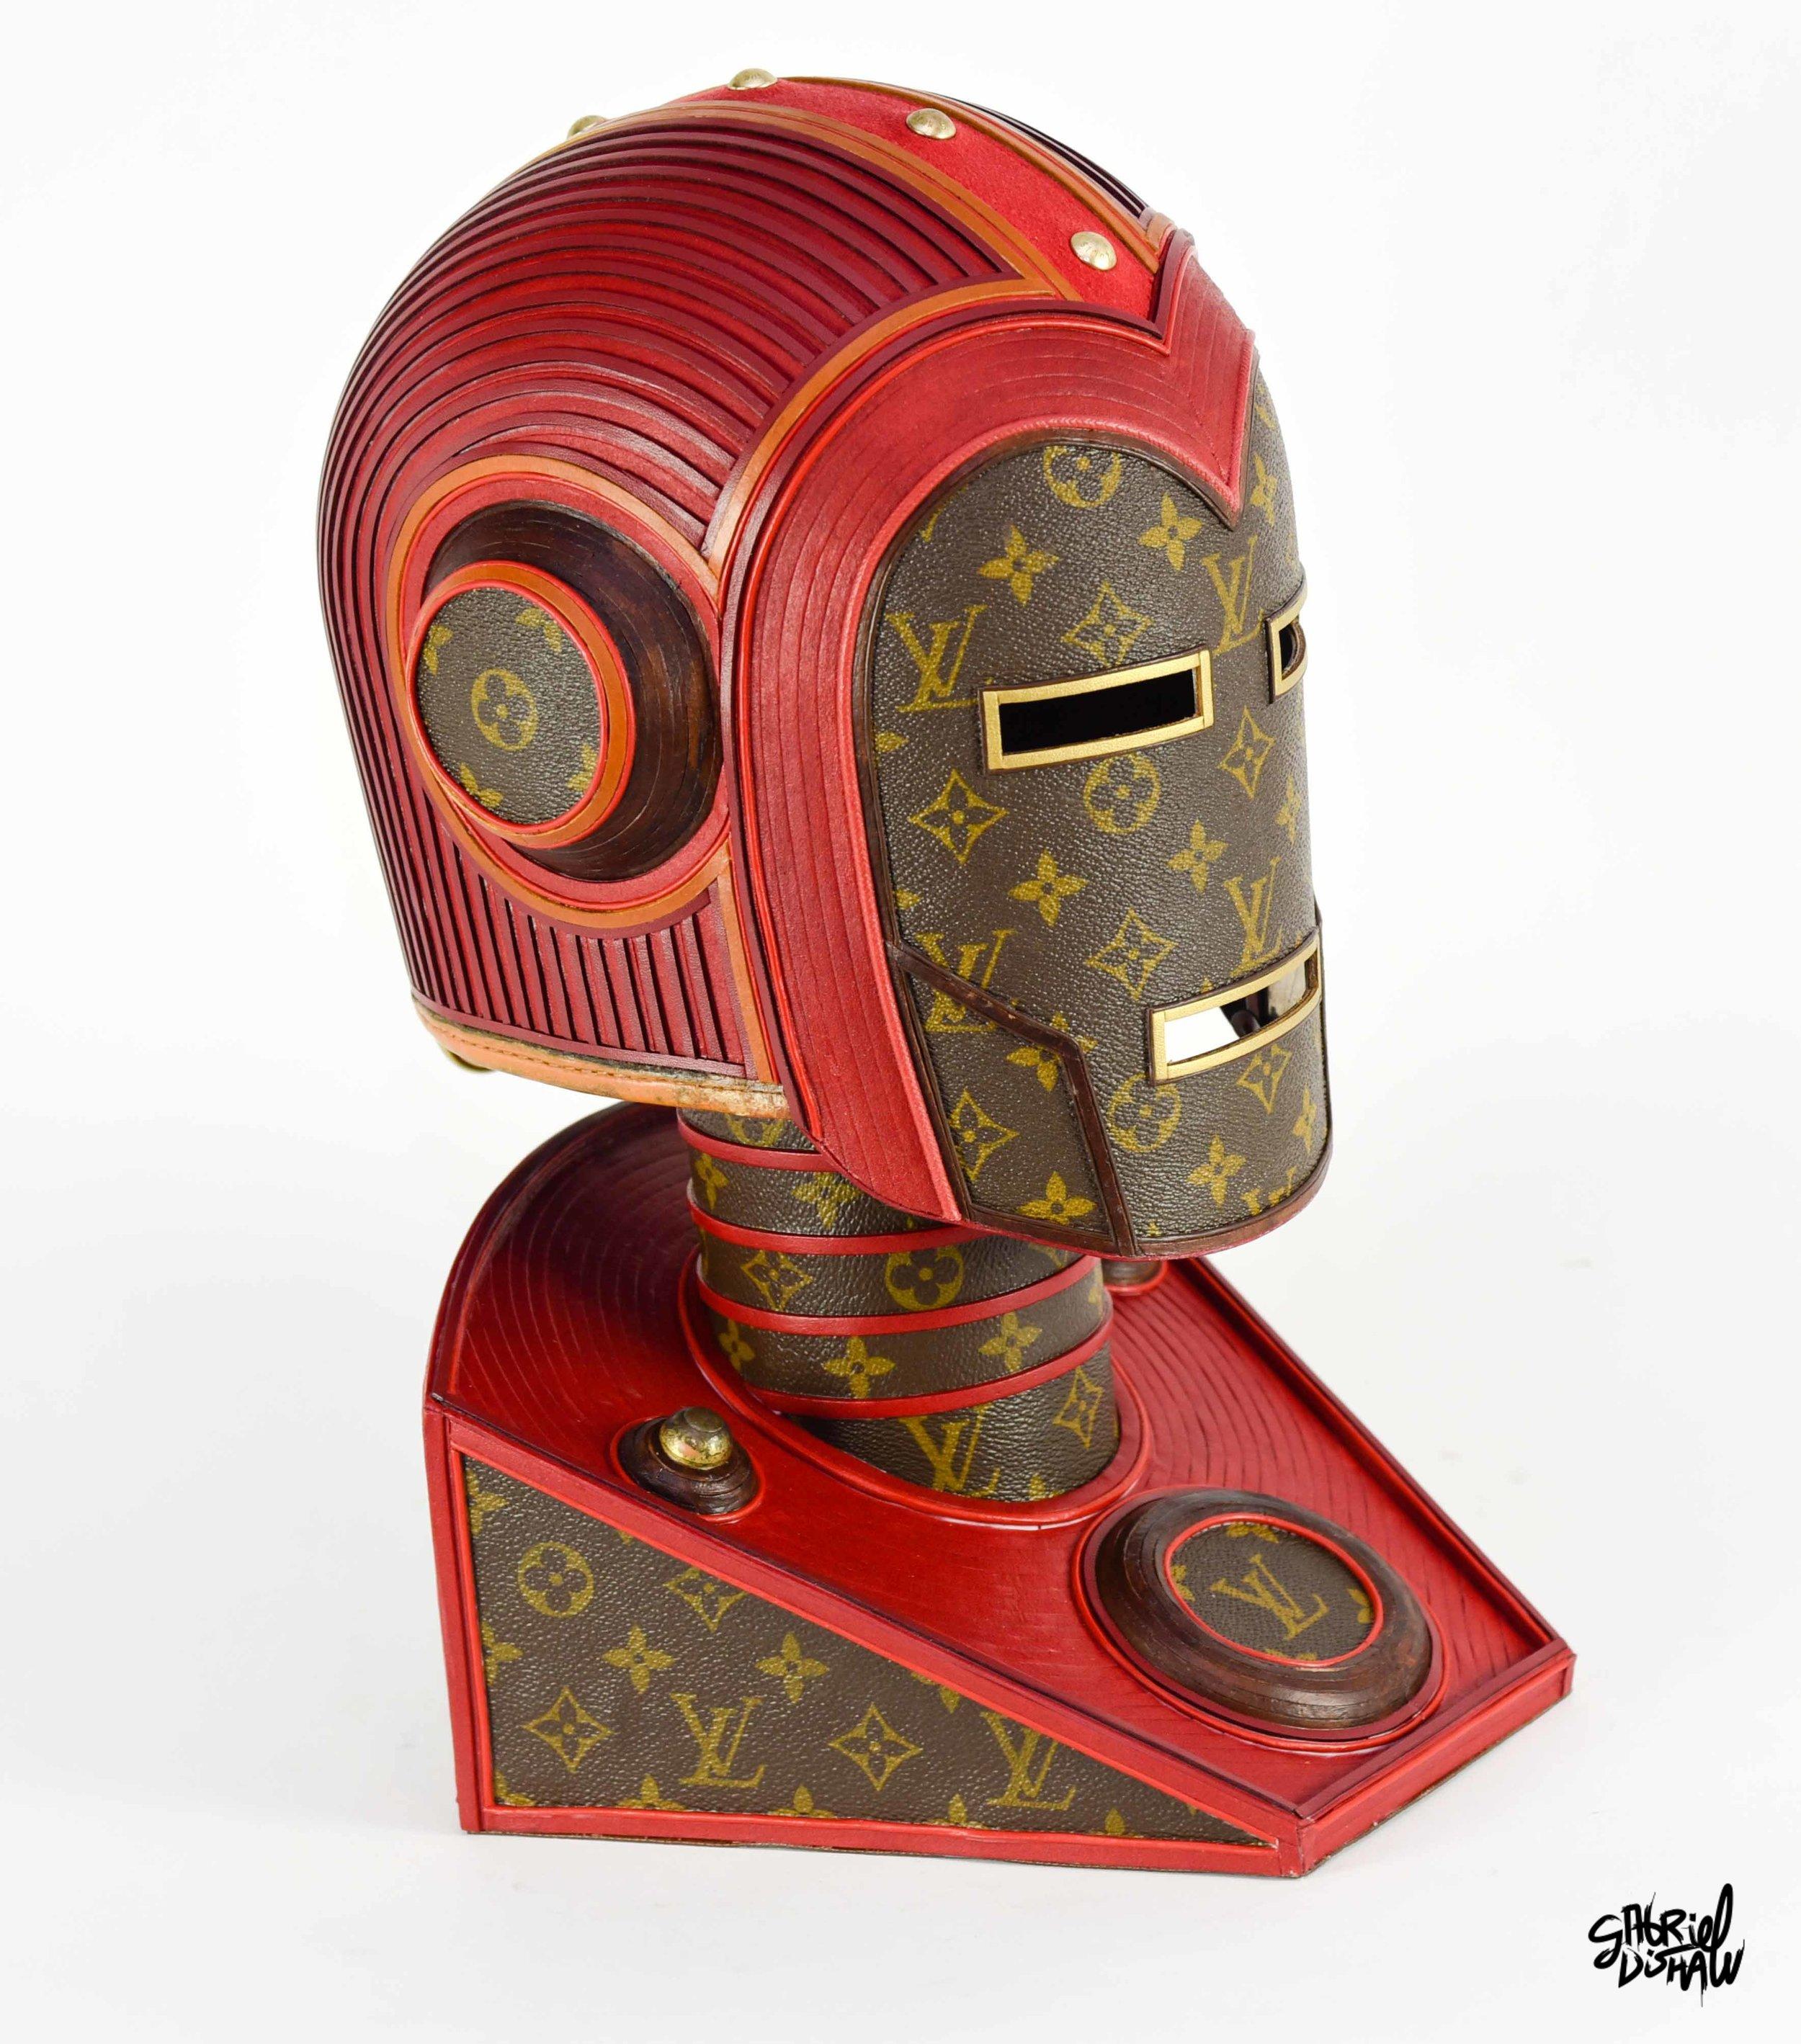 Gabriel Dishaw Vintage Iron Man LV-0002.jpg